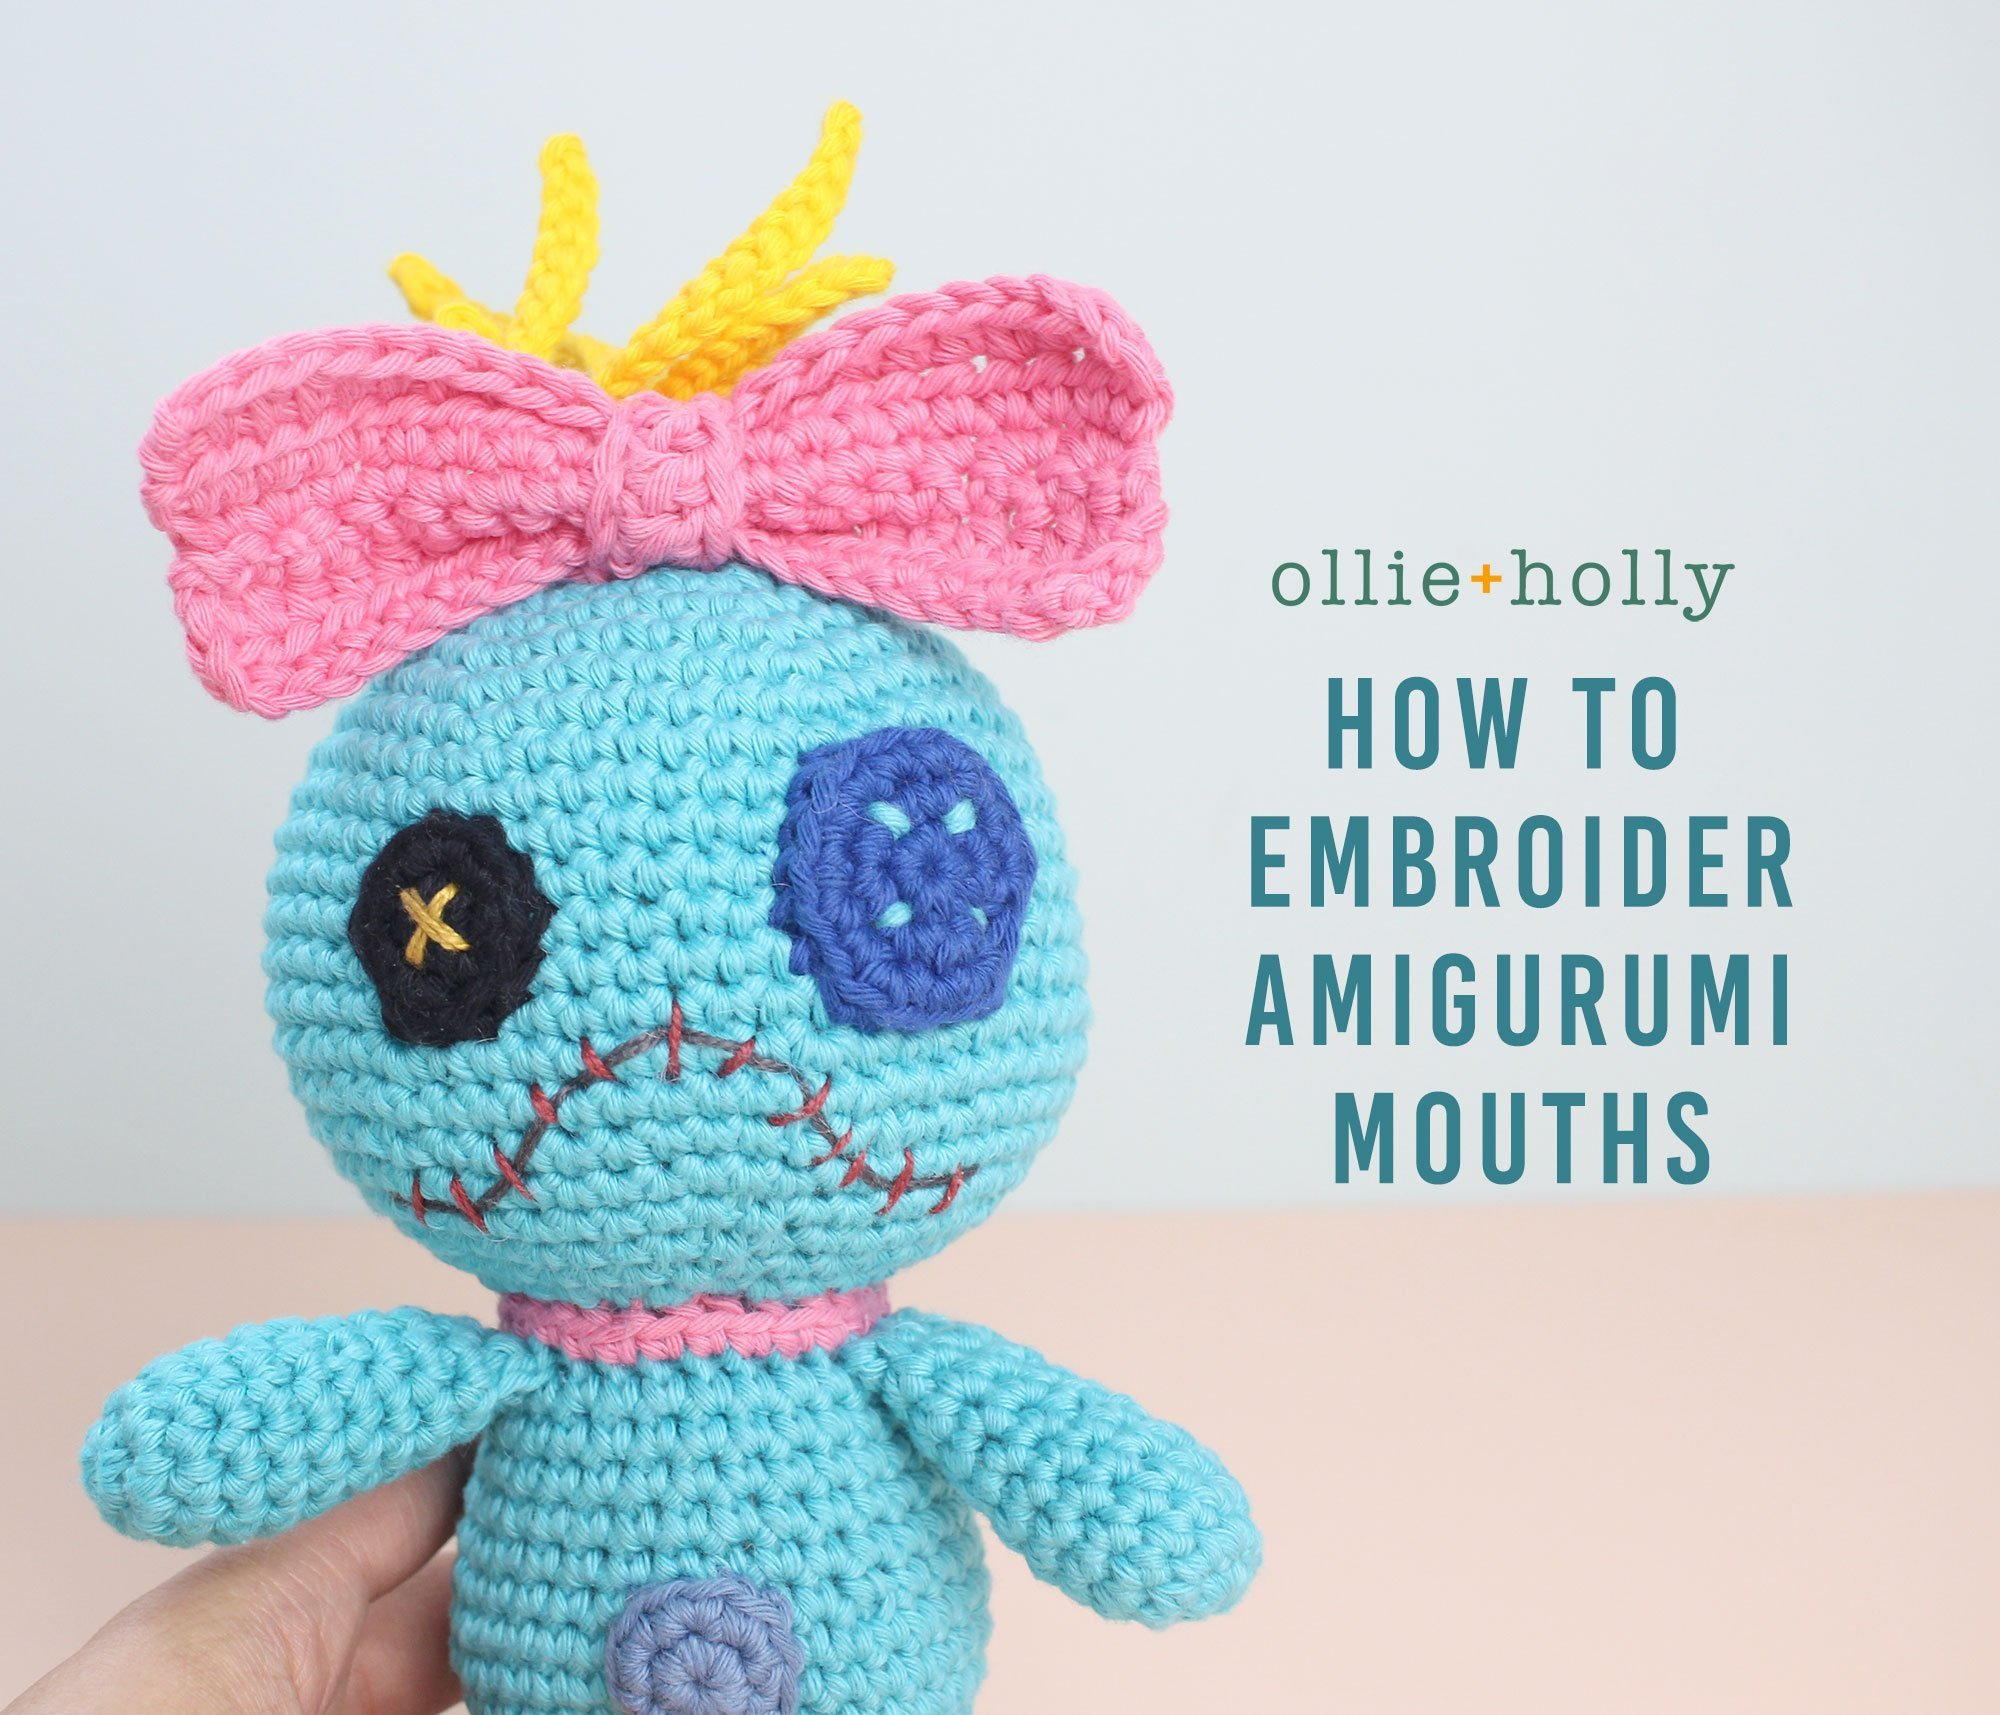 How to Embroider on Amigurumi - Hobium Blog | 1715x2000